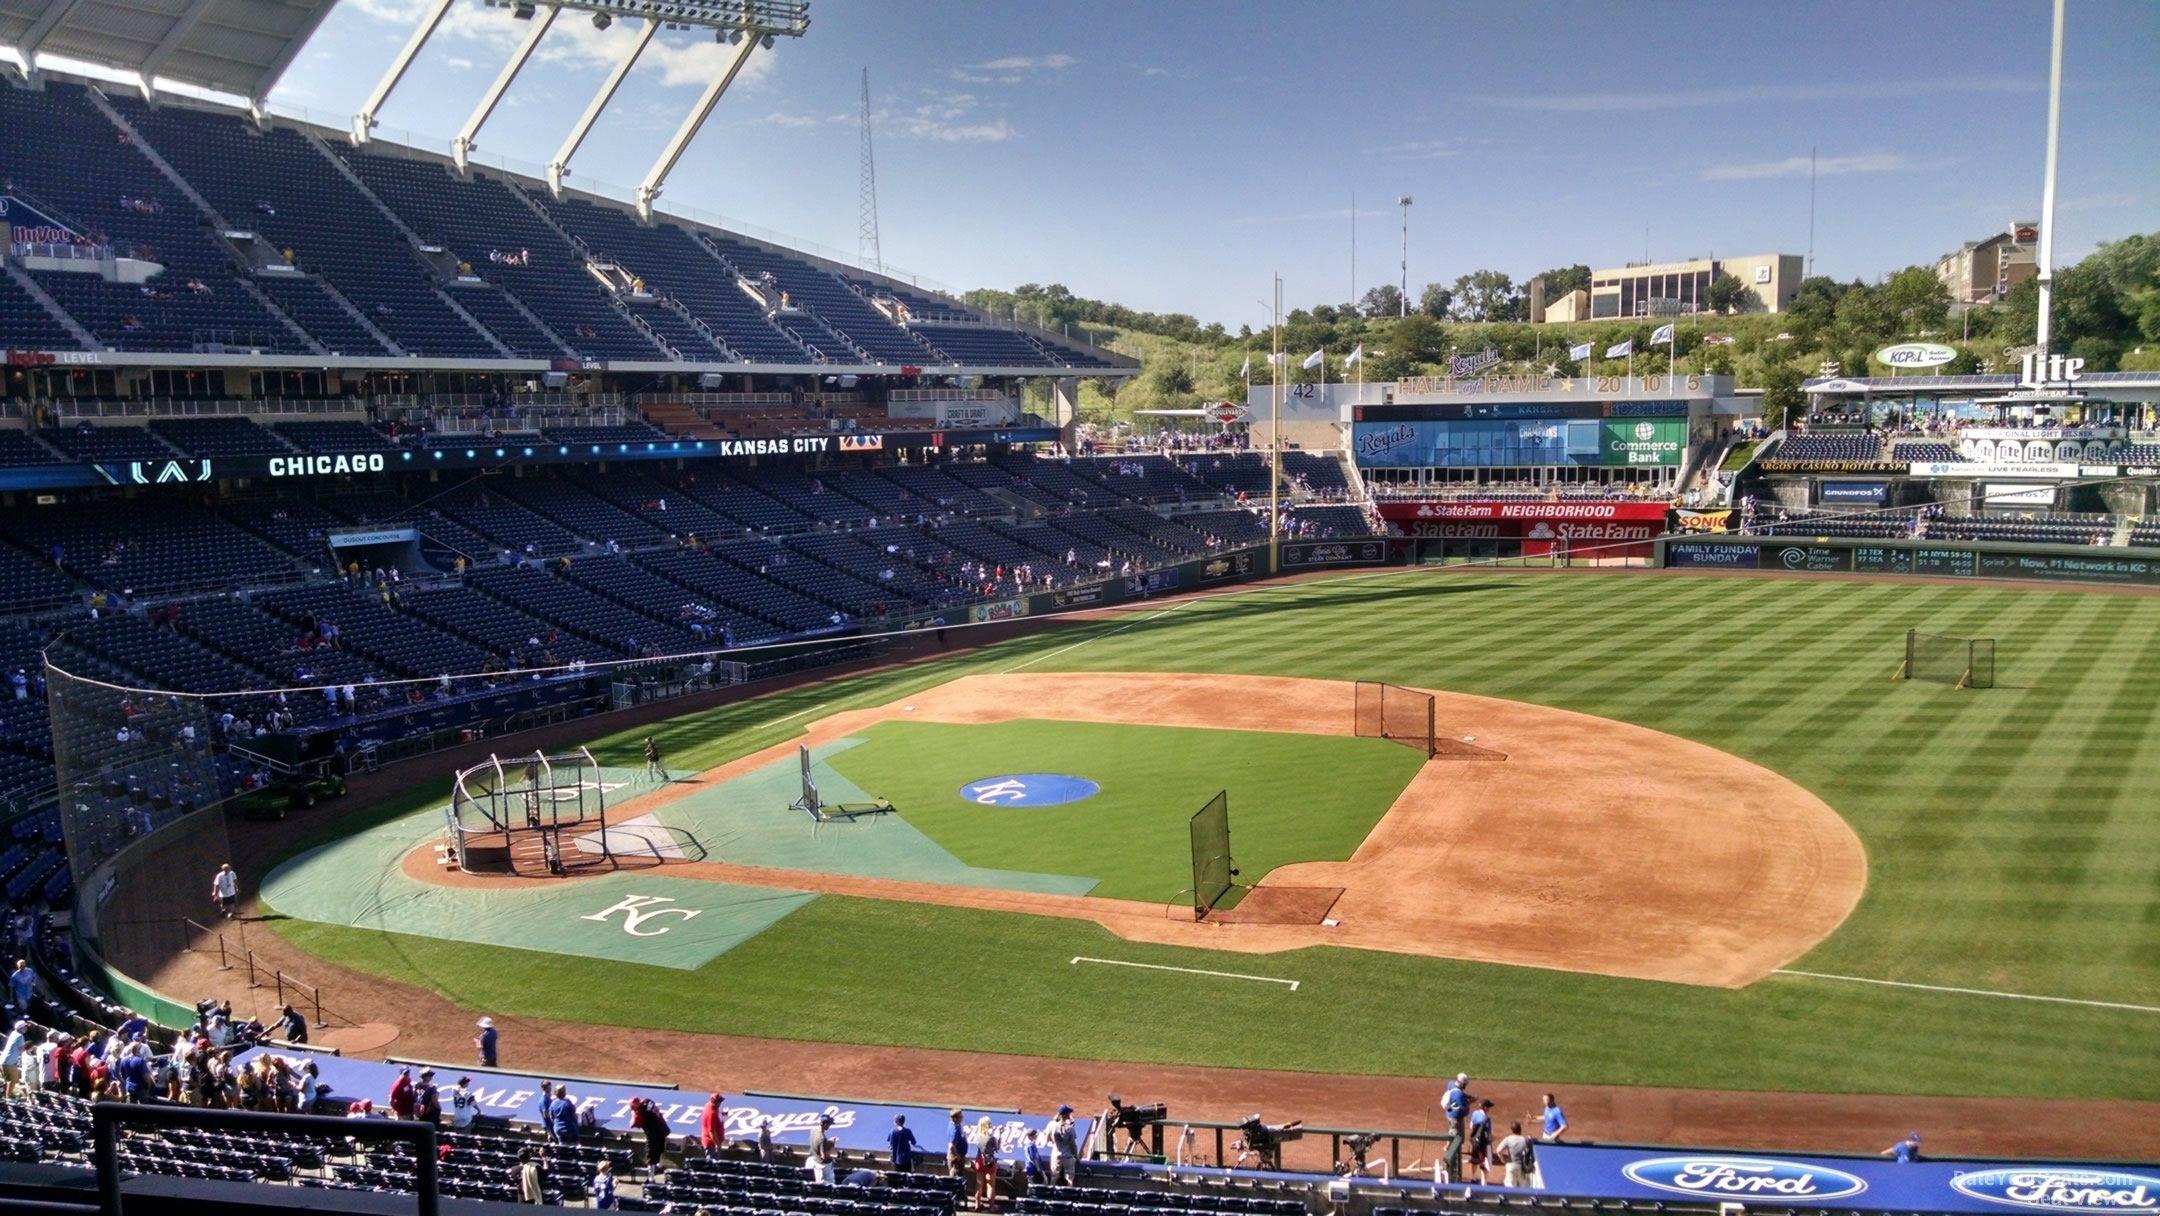 Royals Stadium Seating Map Best Seat 2018